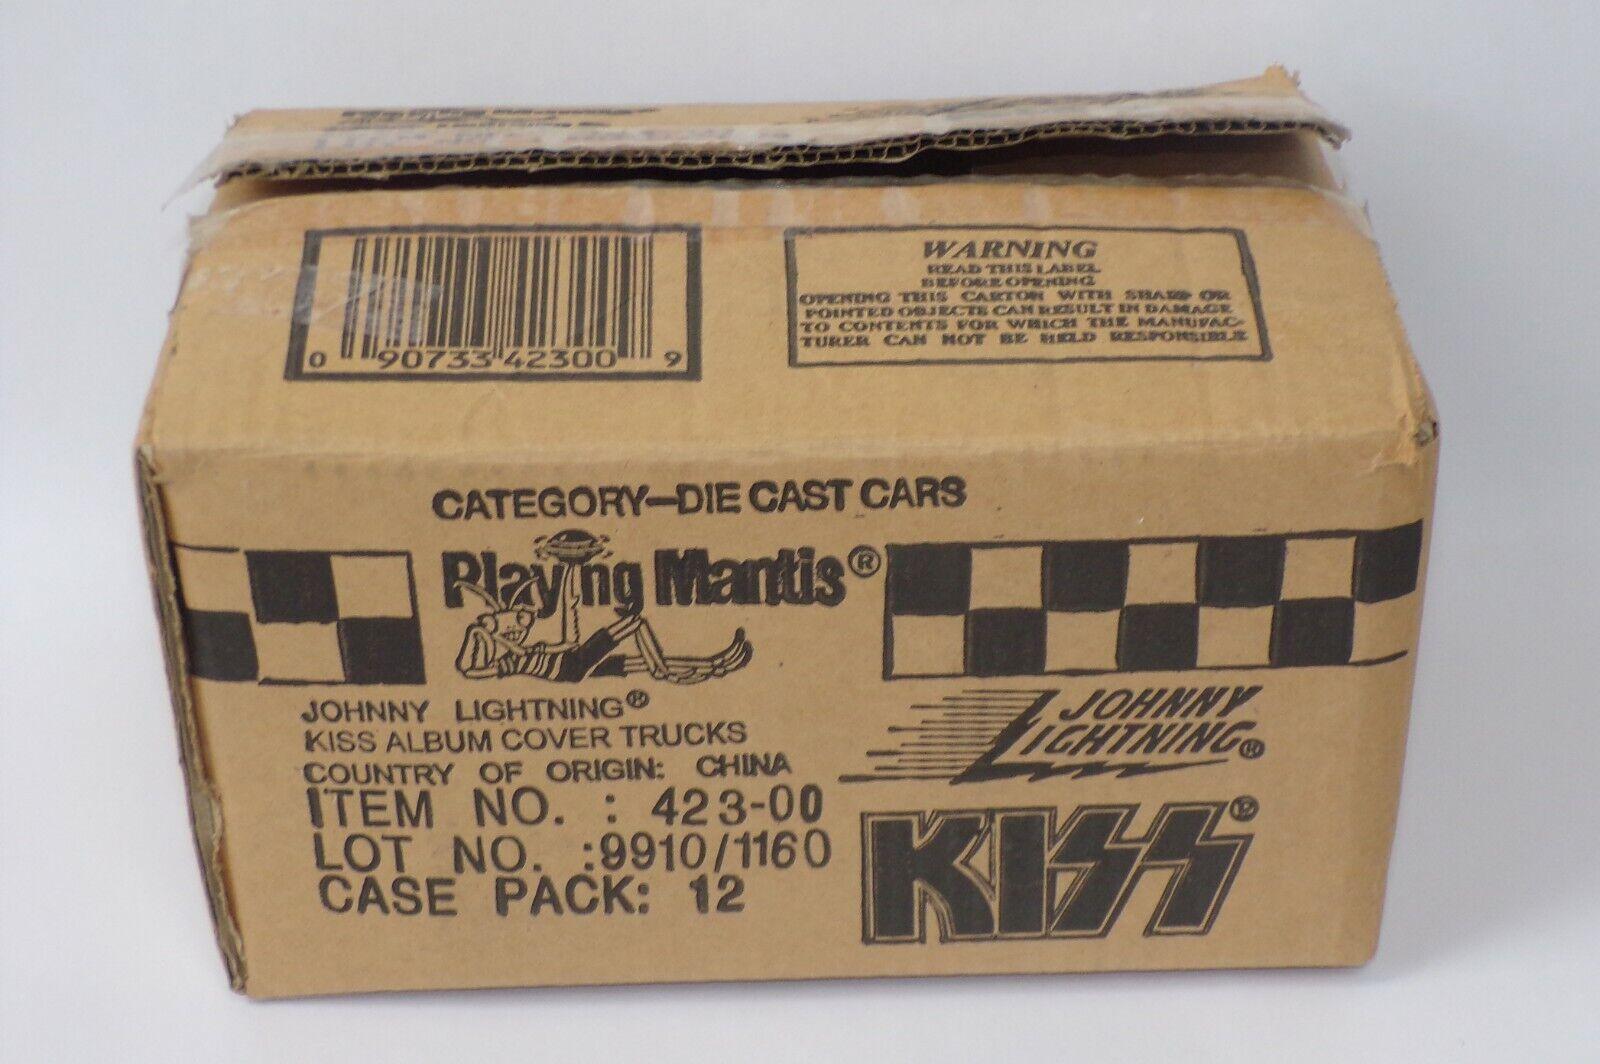 KISS Band Johnny Lightning Diecast Truck EMPTY Display Case Logo Shipping Box